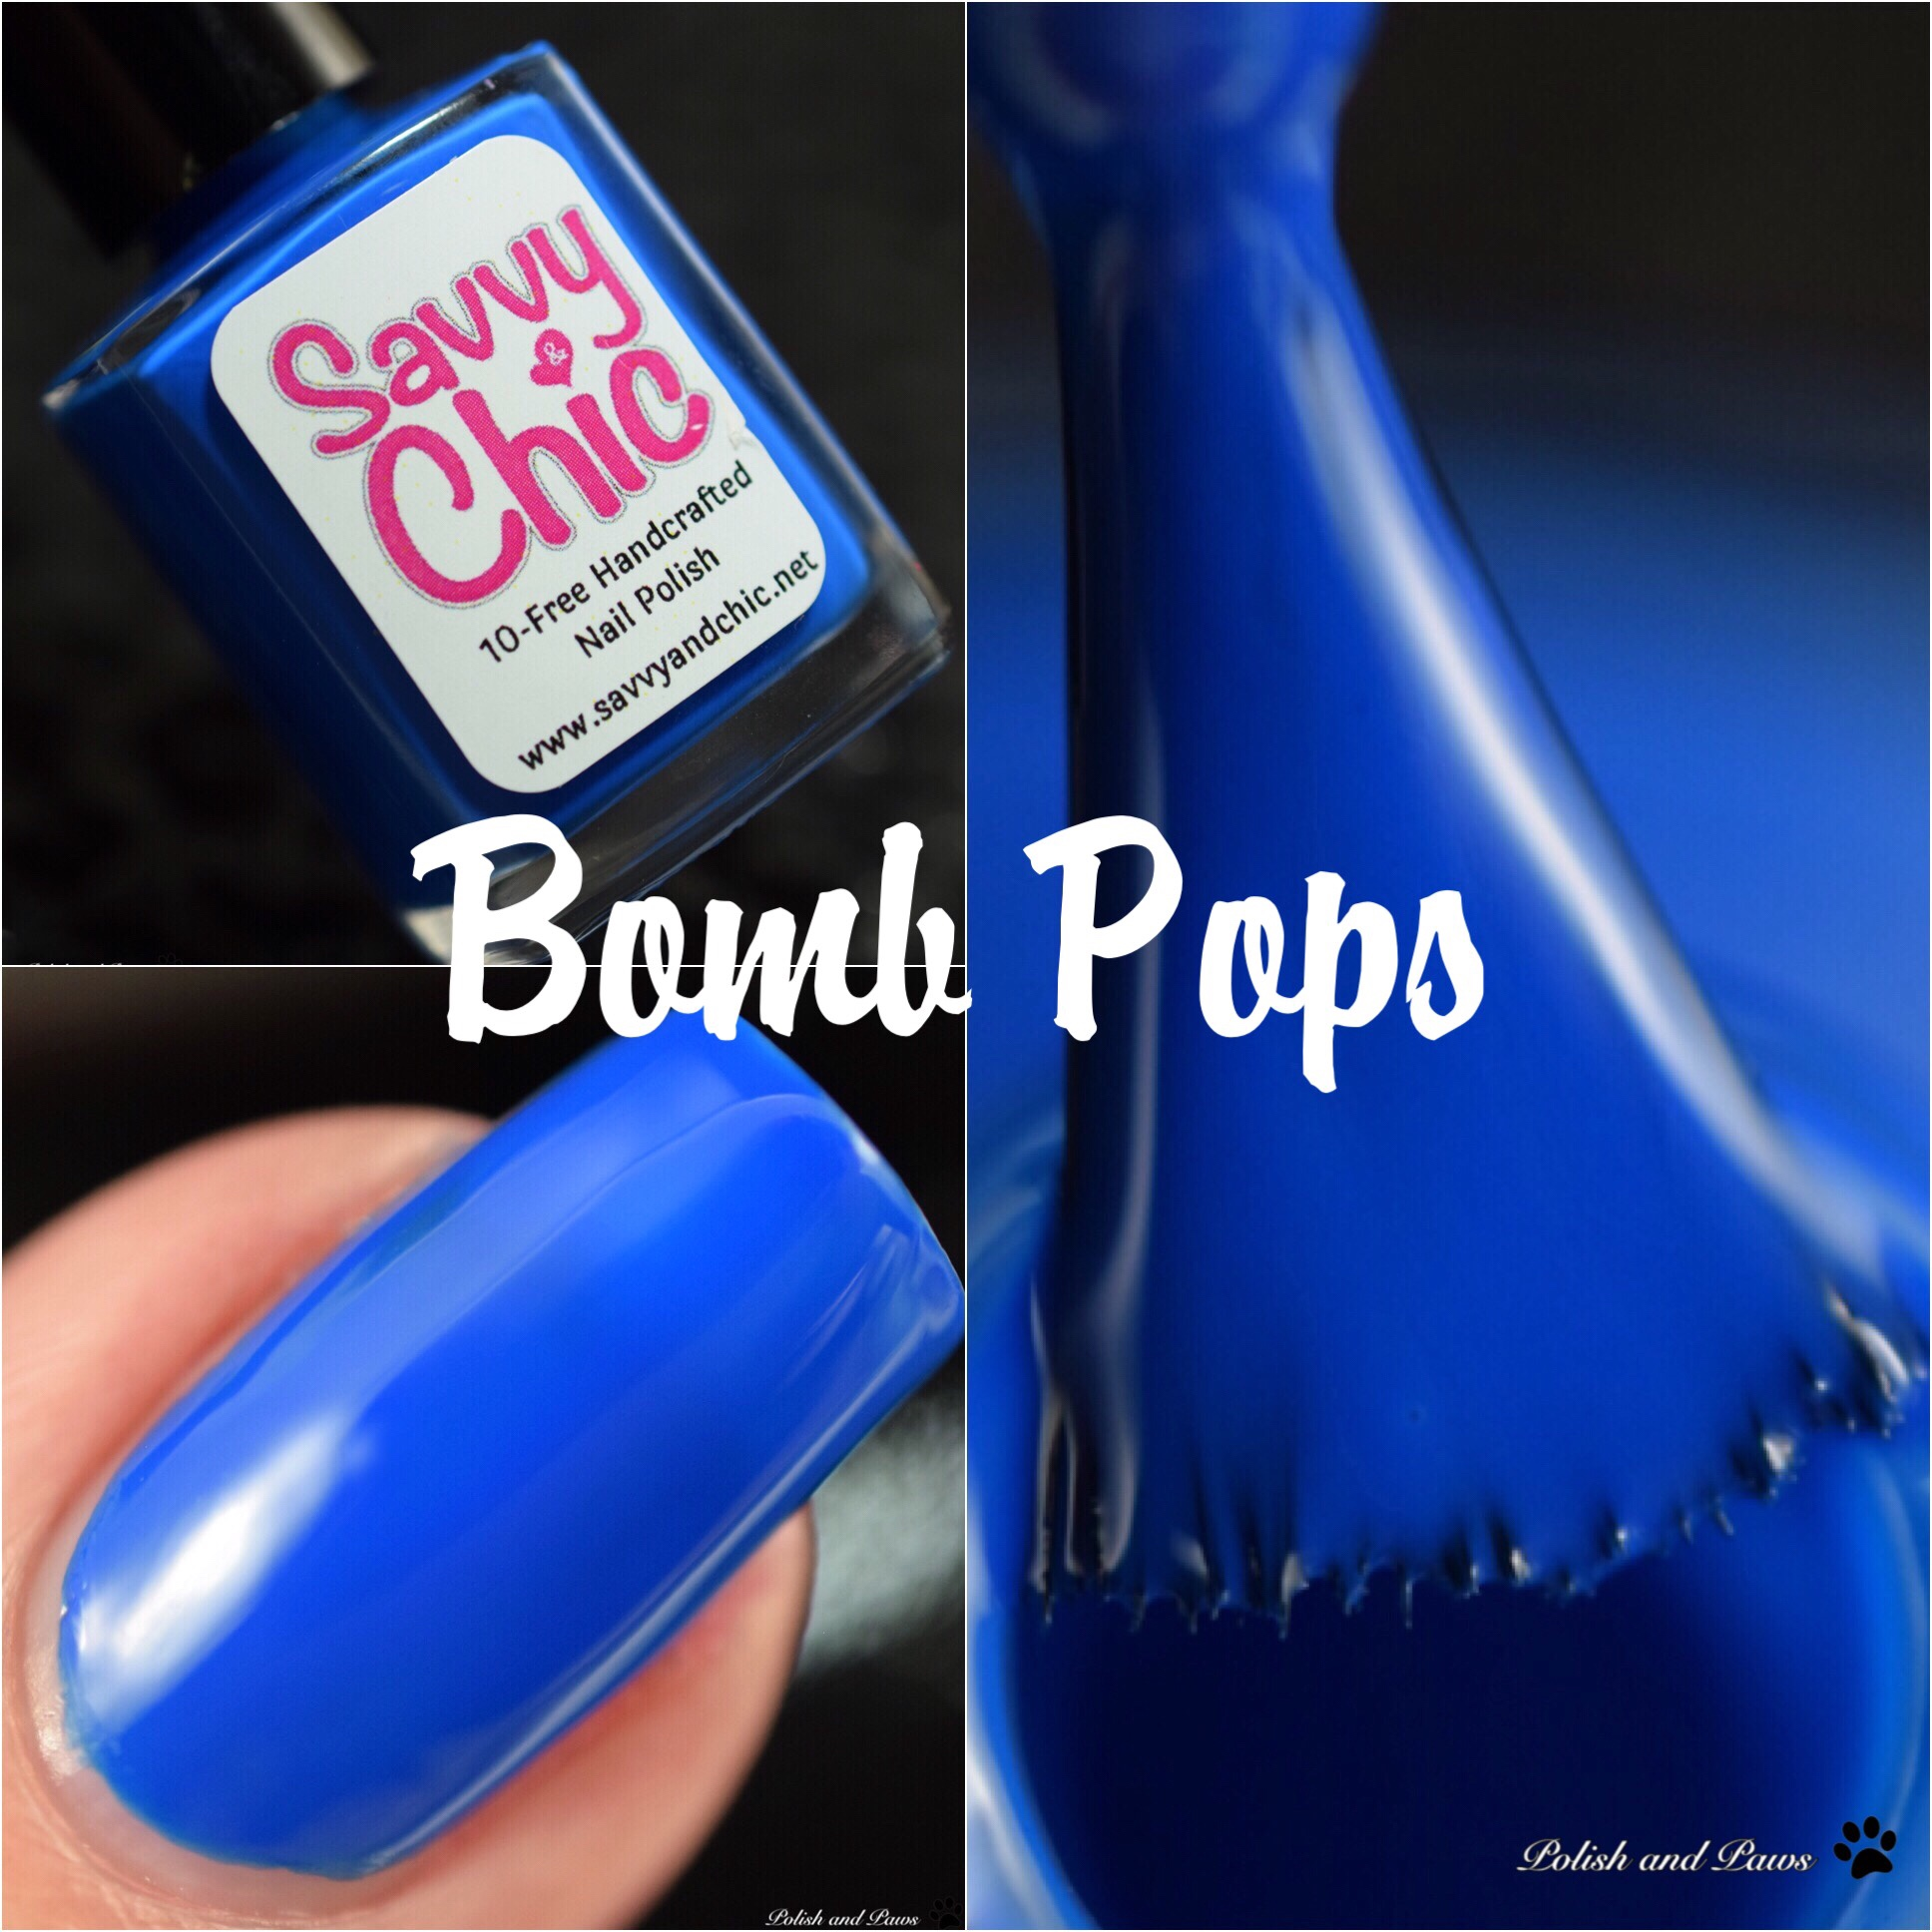 Savvy & Chic Bomb Pops